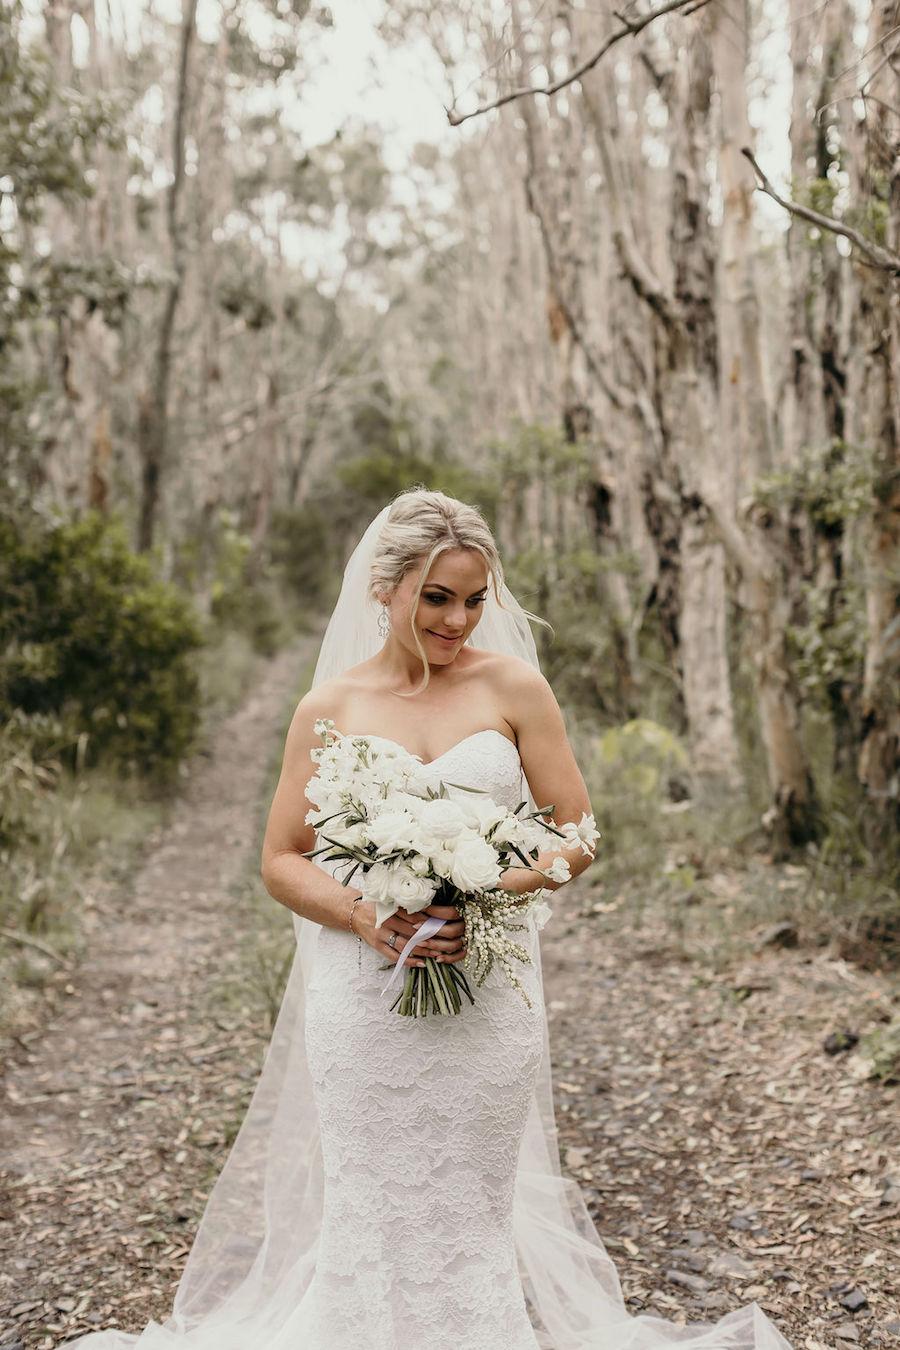 tweed-coast-weddings-wedding-venue-osteria-casuarina-ceremony-reception-5D3A7096.jpg